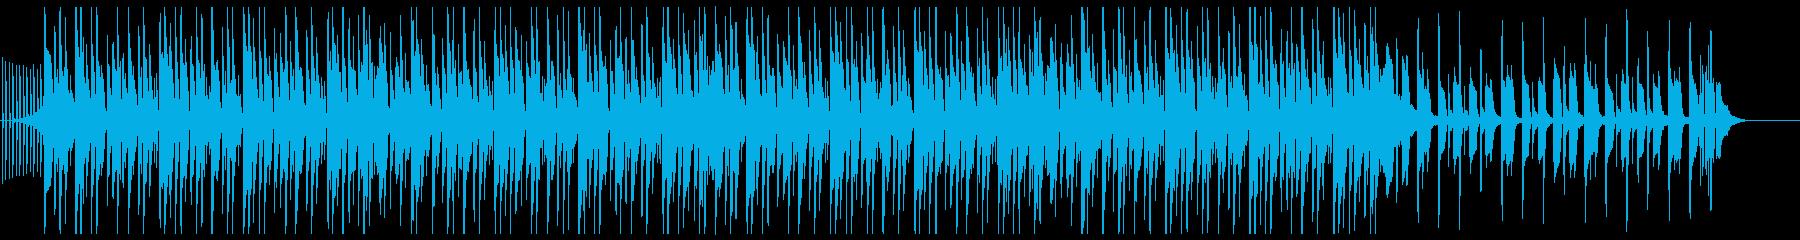 k-POP、洋楽、ヒップホップ cの再生済みの波形